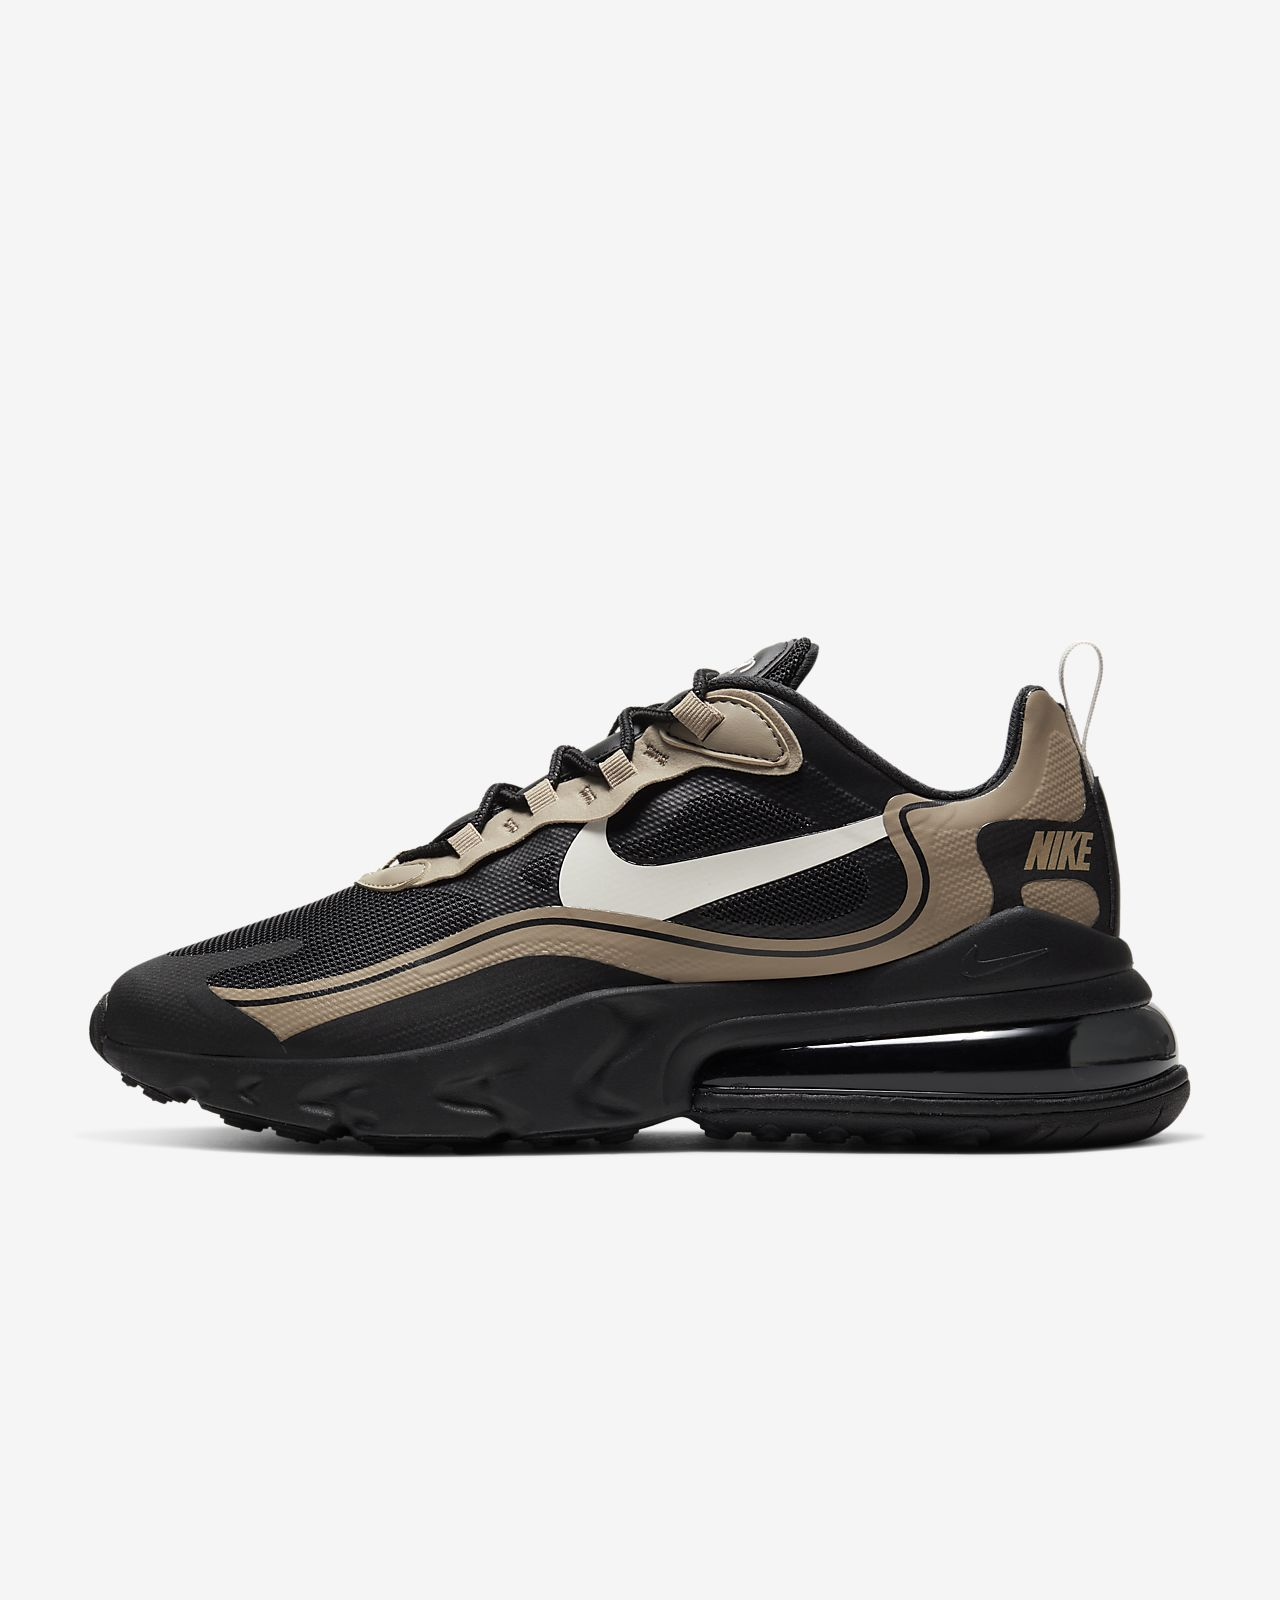 siti americani per scarpe nike air max 270